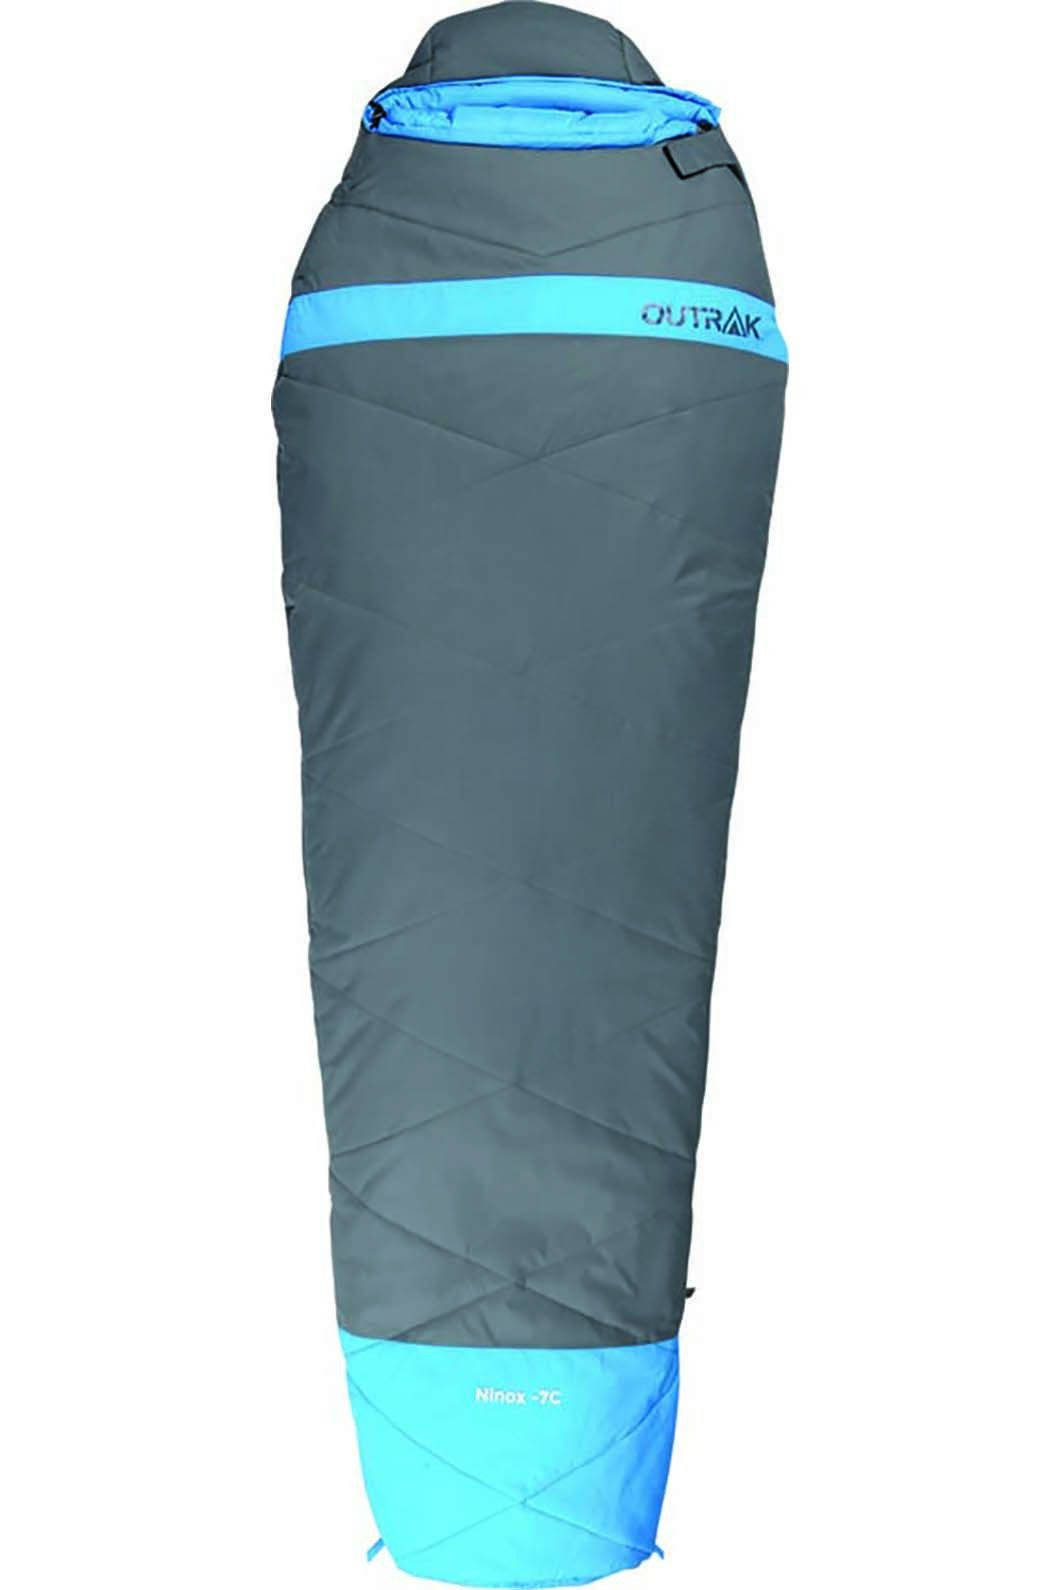 Outrak Ninox Sleeping Bag -7, None, hi-res